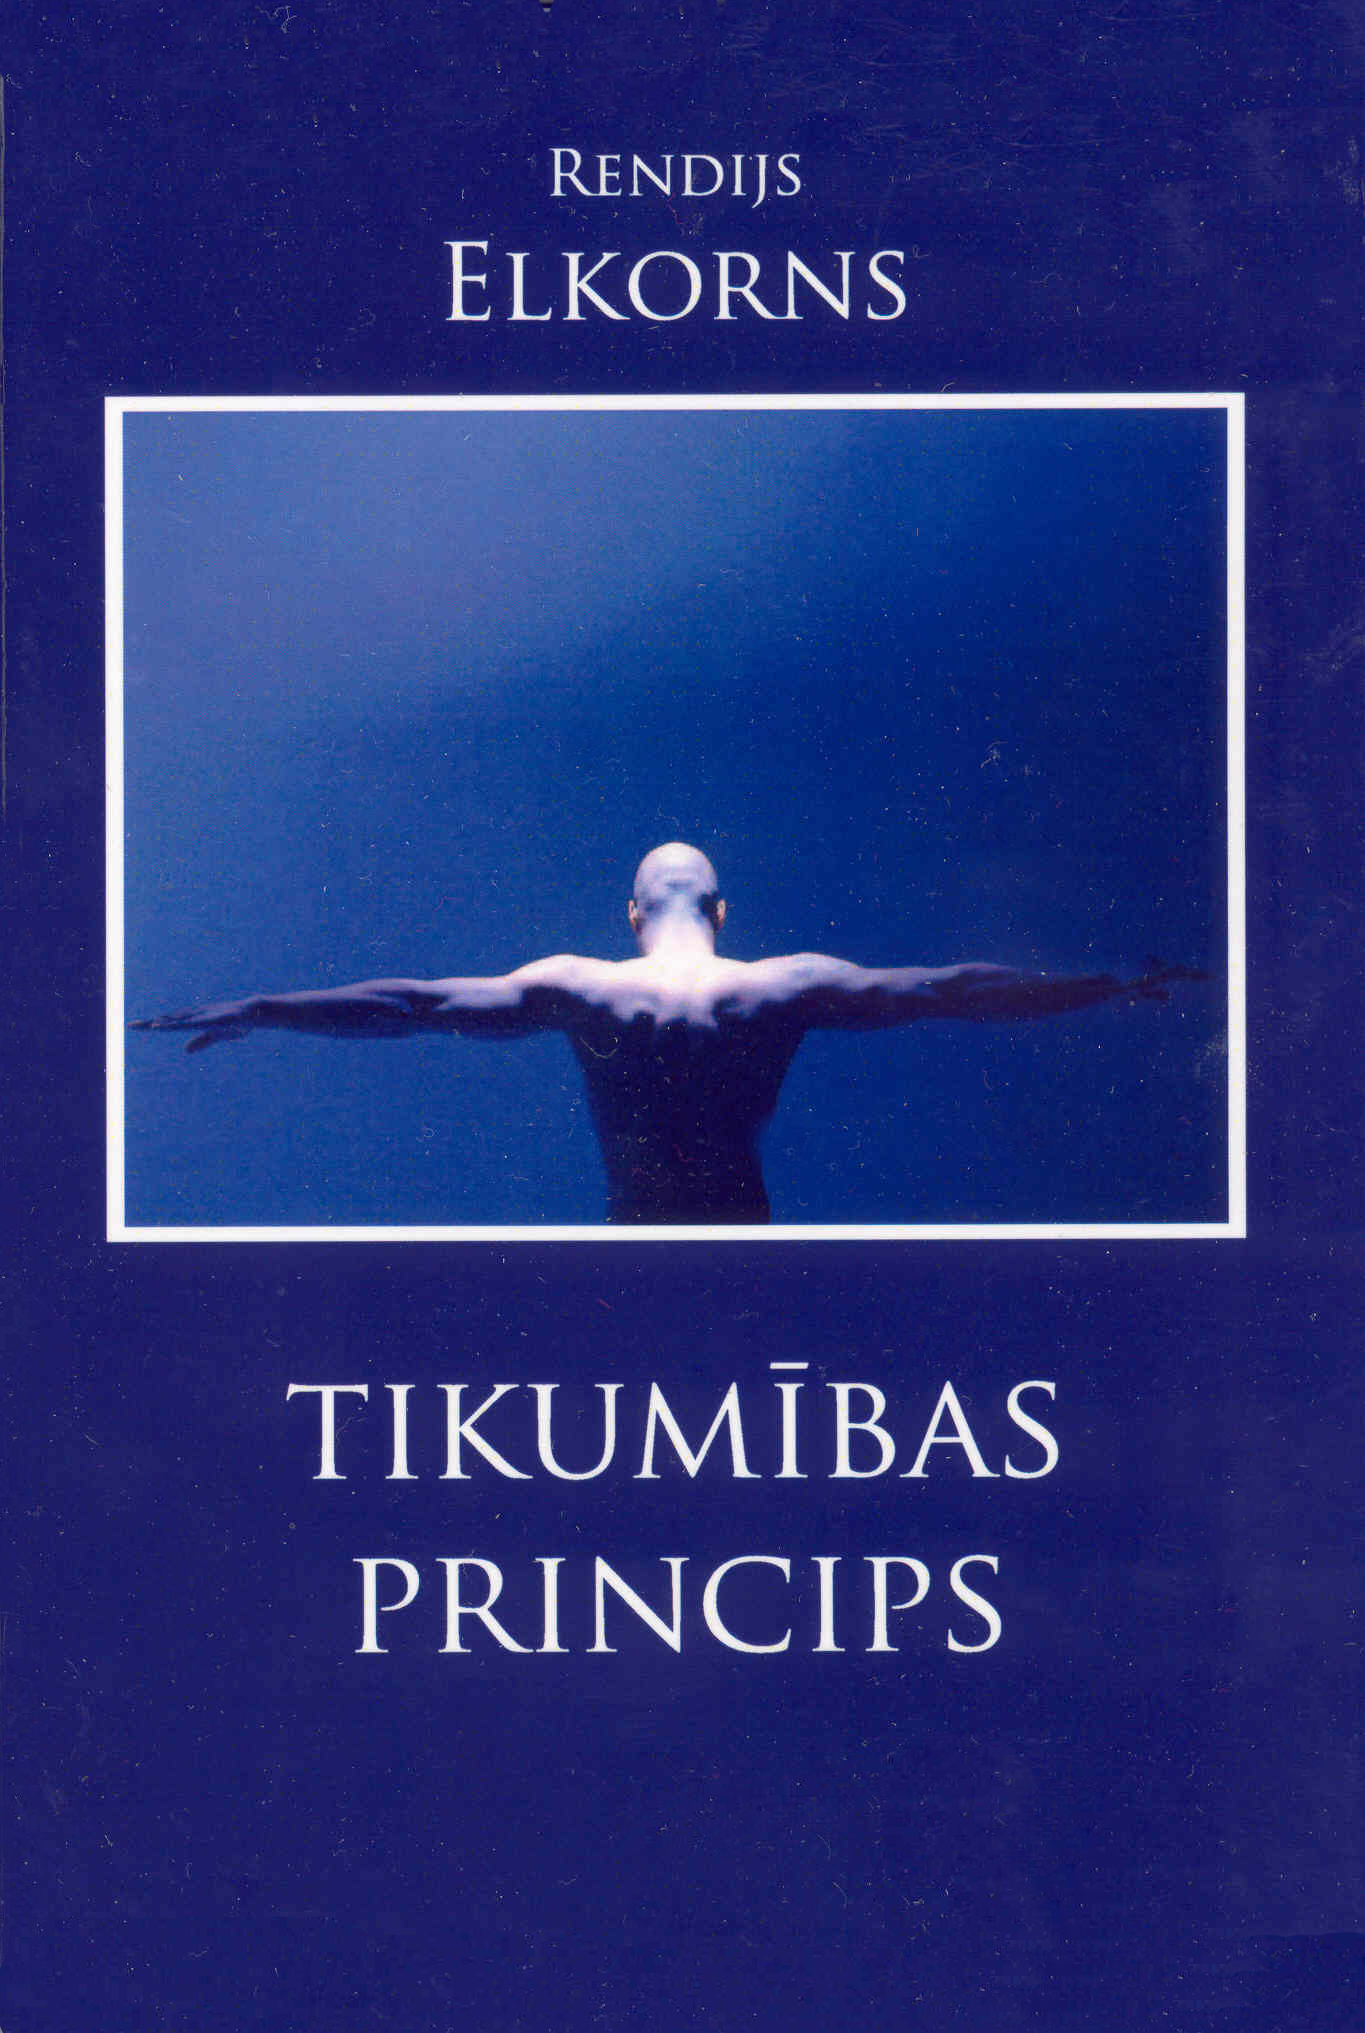 purity-principle-latvian.jpg